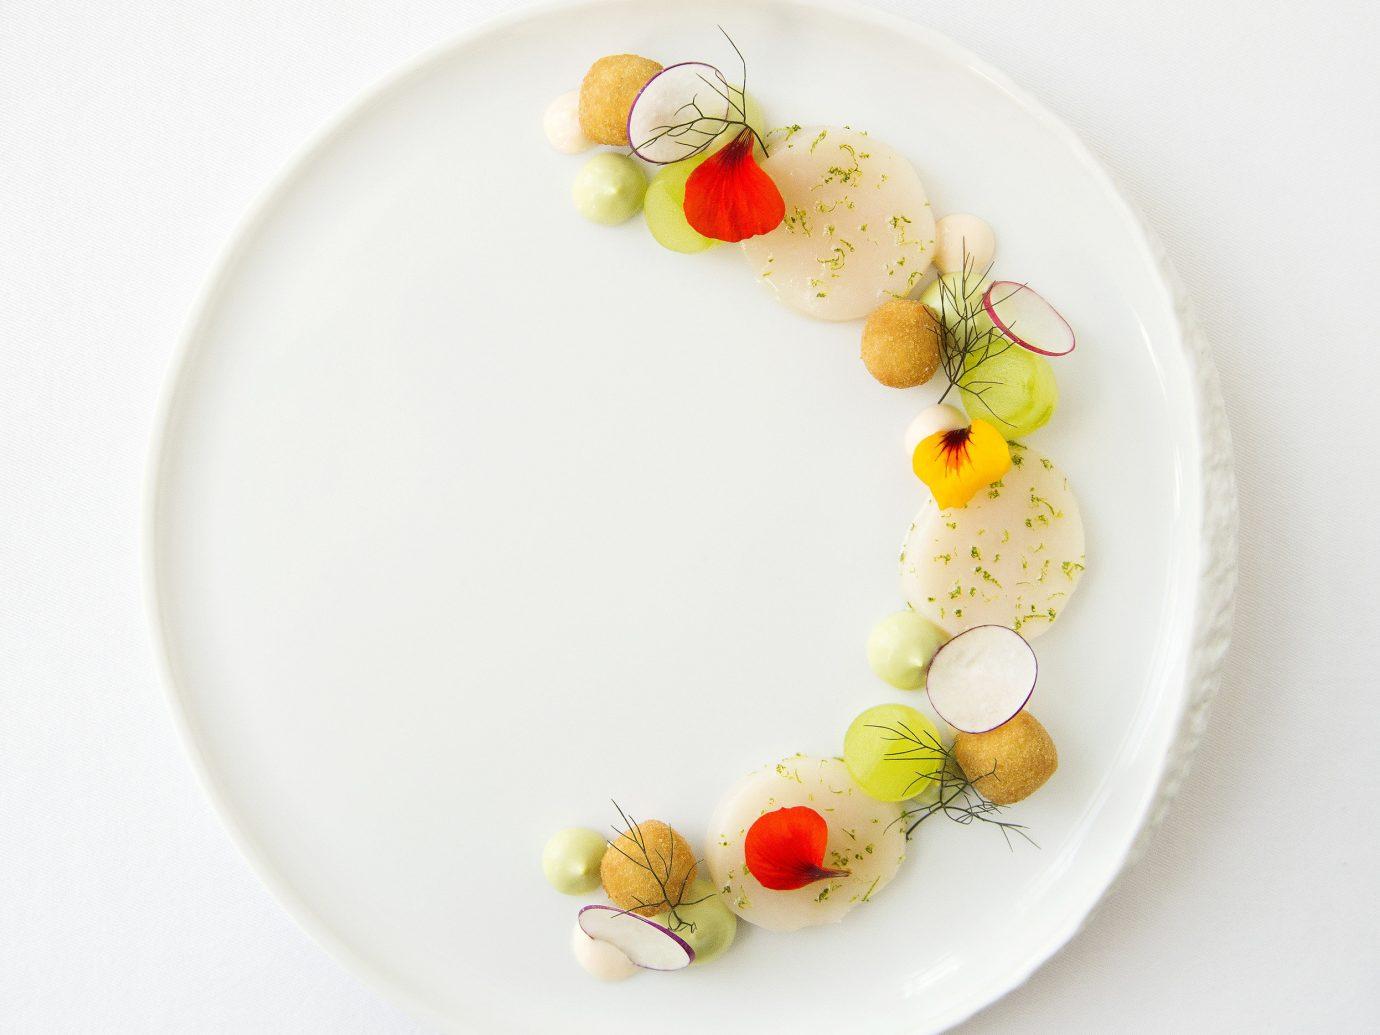 England europe London Luxury Travel Romantic Hotels plate food dishware indoor tableware platter white porcelain serveware ceramic meal